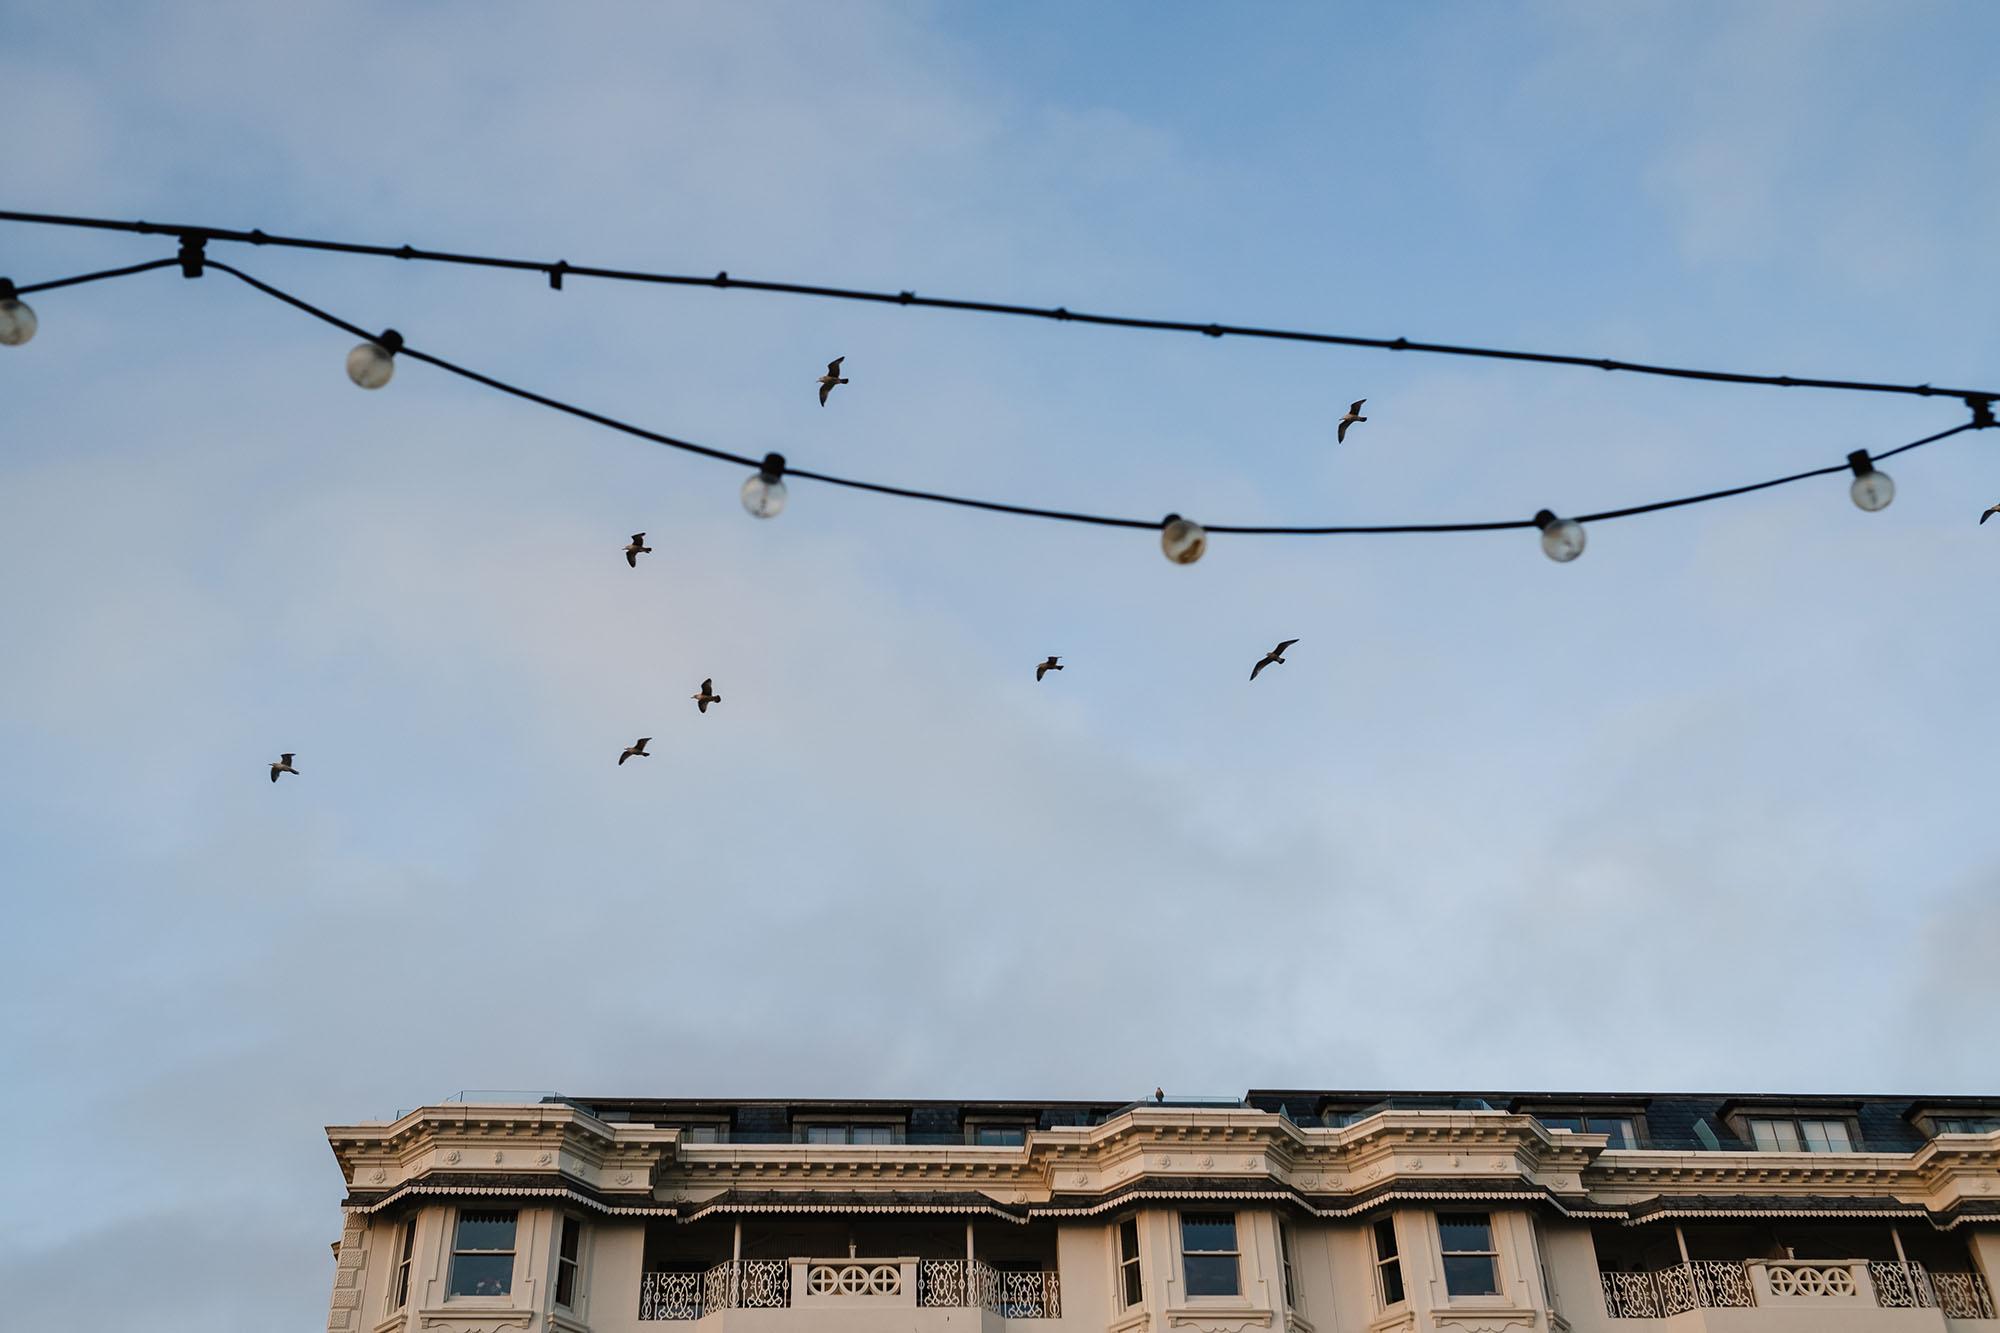 worthing sky with birds